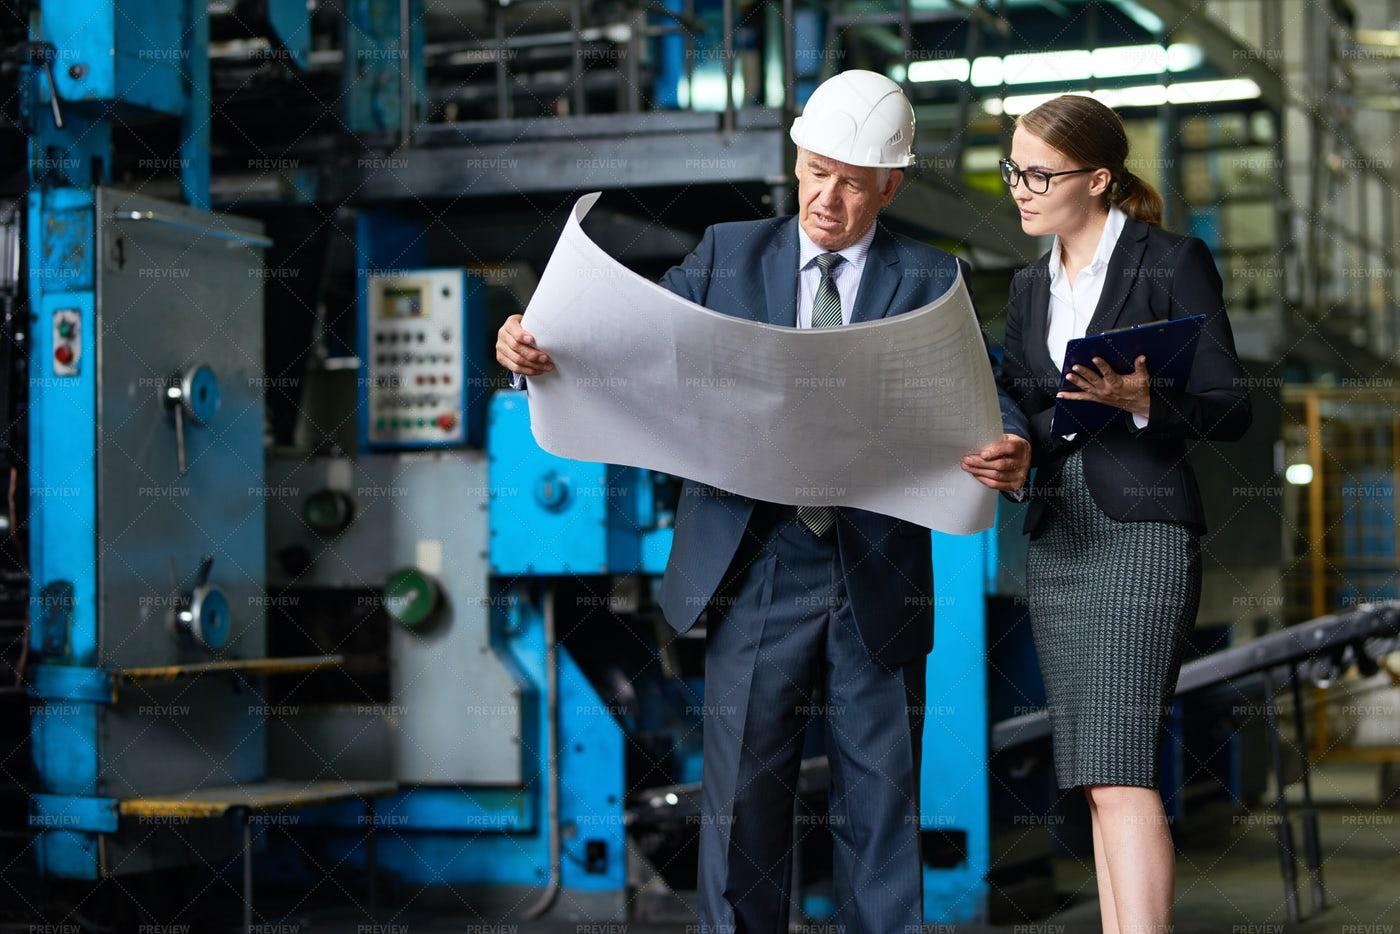 Senior Inspector Looking At Factory...: Stock Photos